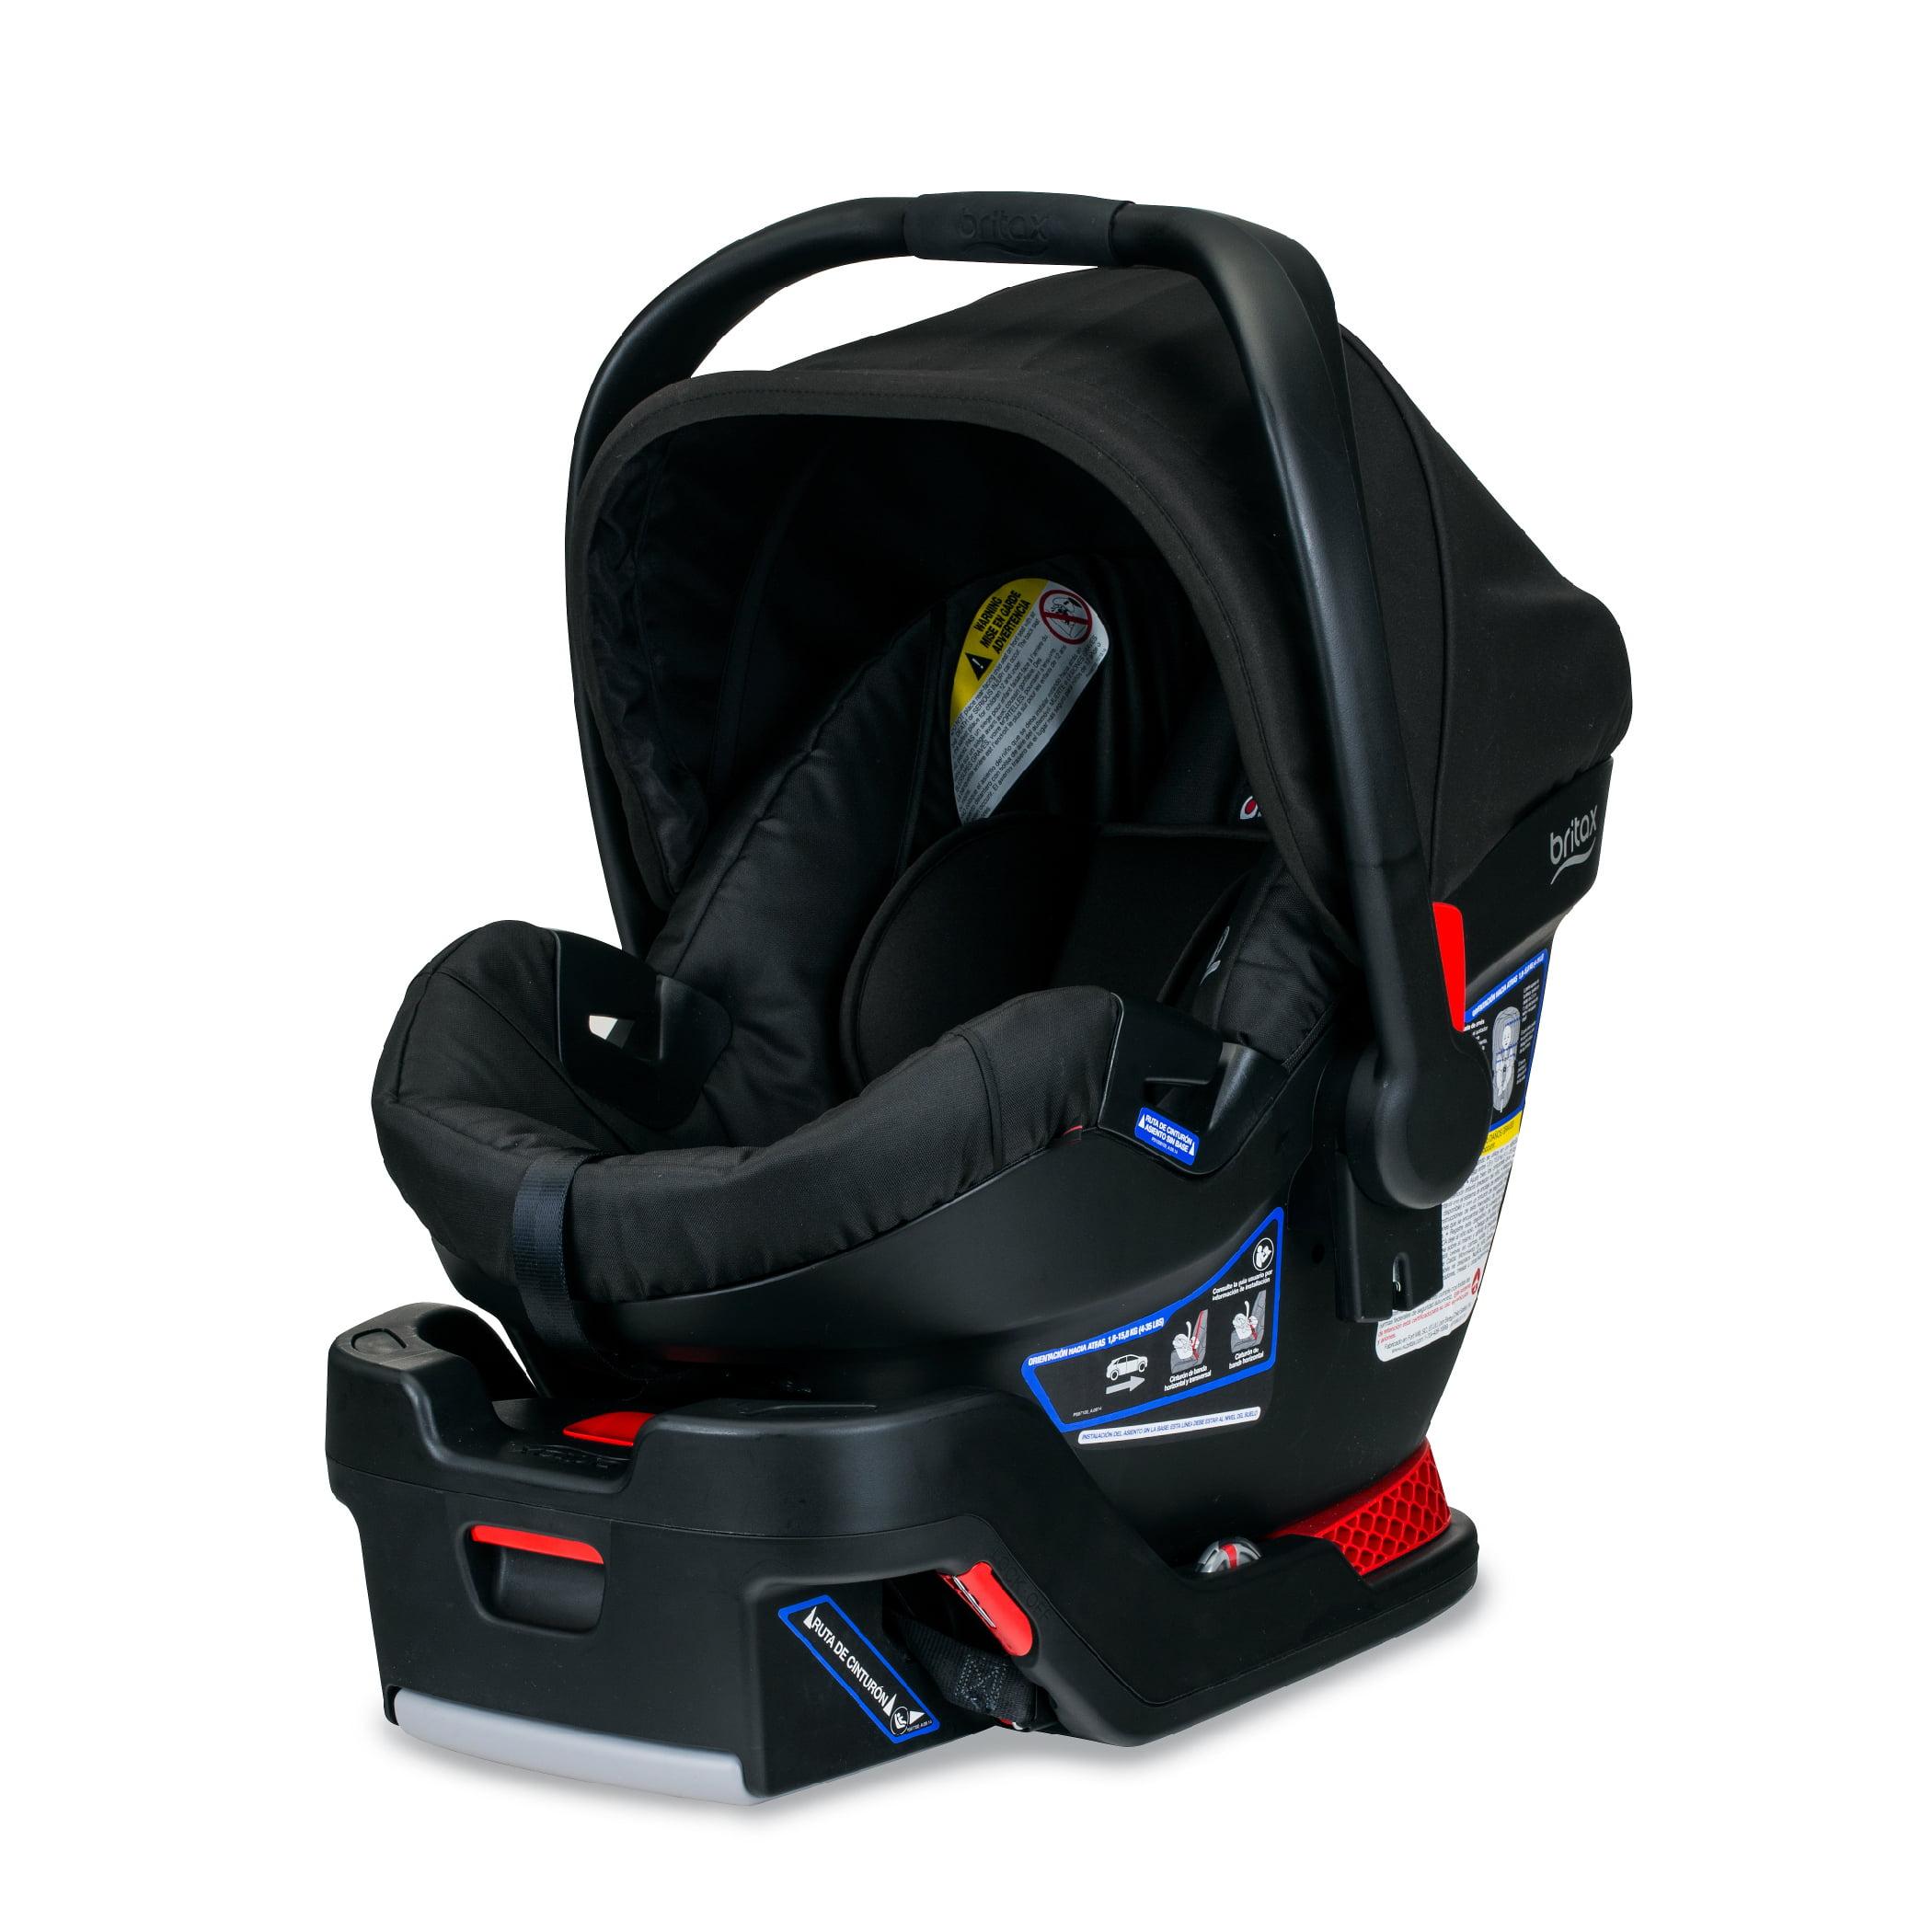 Britax B-Safe Gen2 Infant Car Seat, Eclipse Black SafeWash - Walmart.com -  Walmart.com